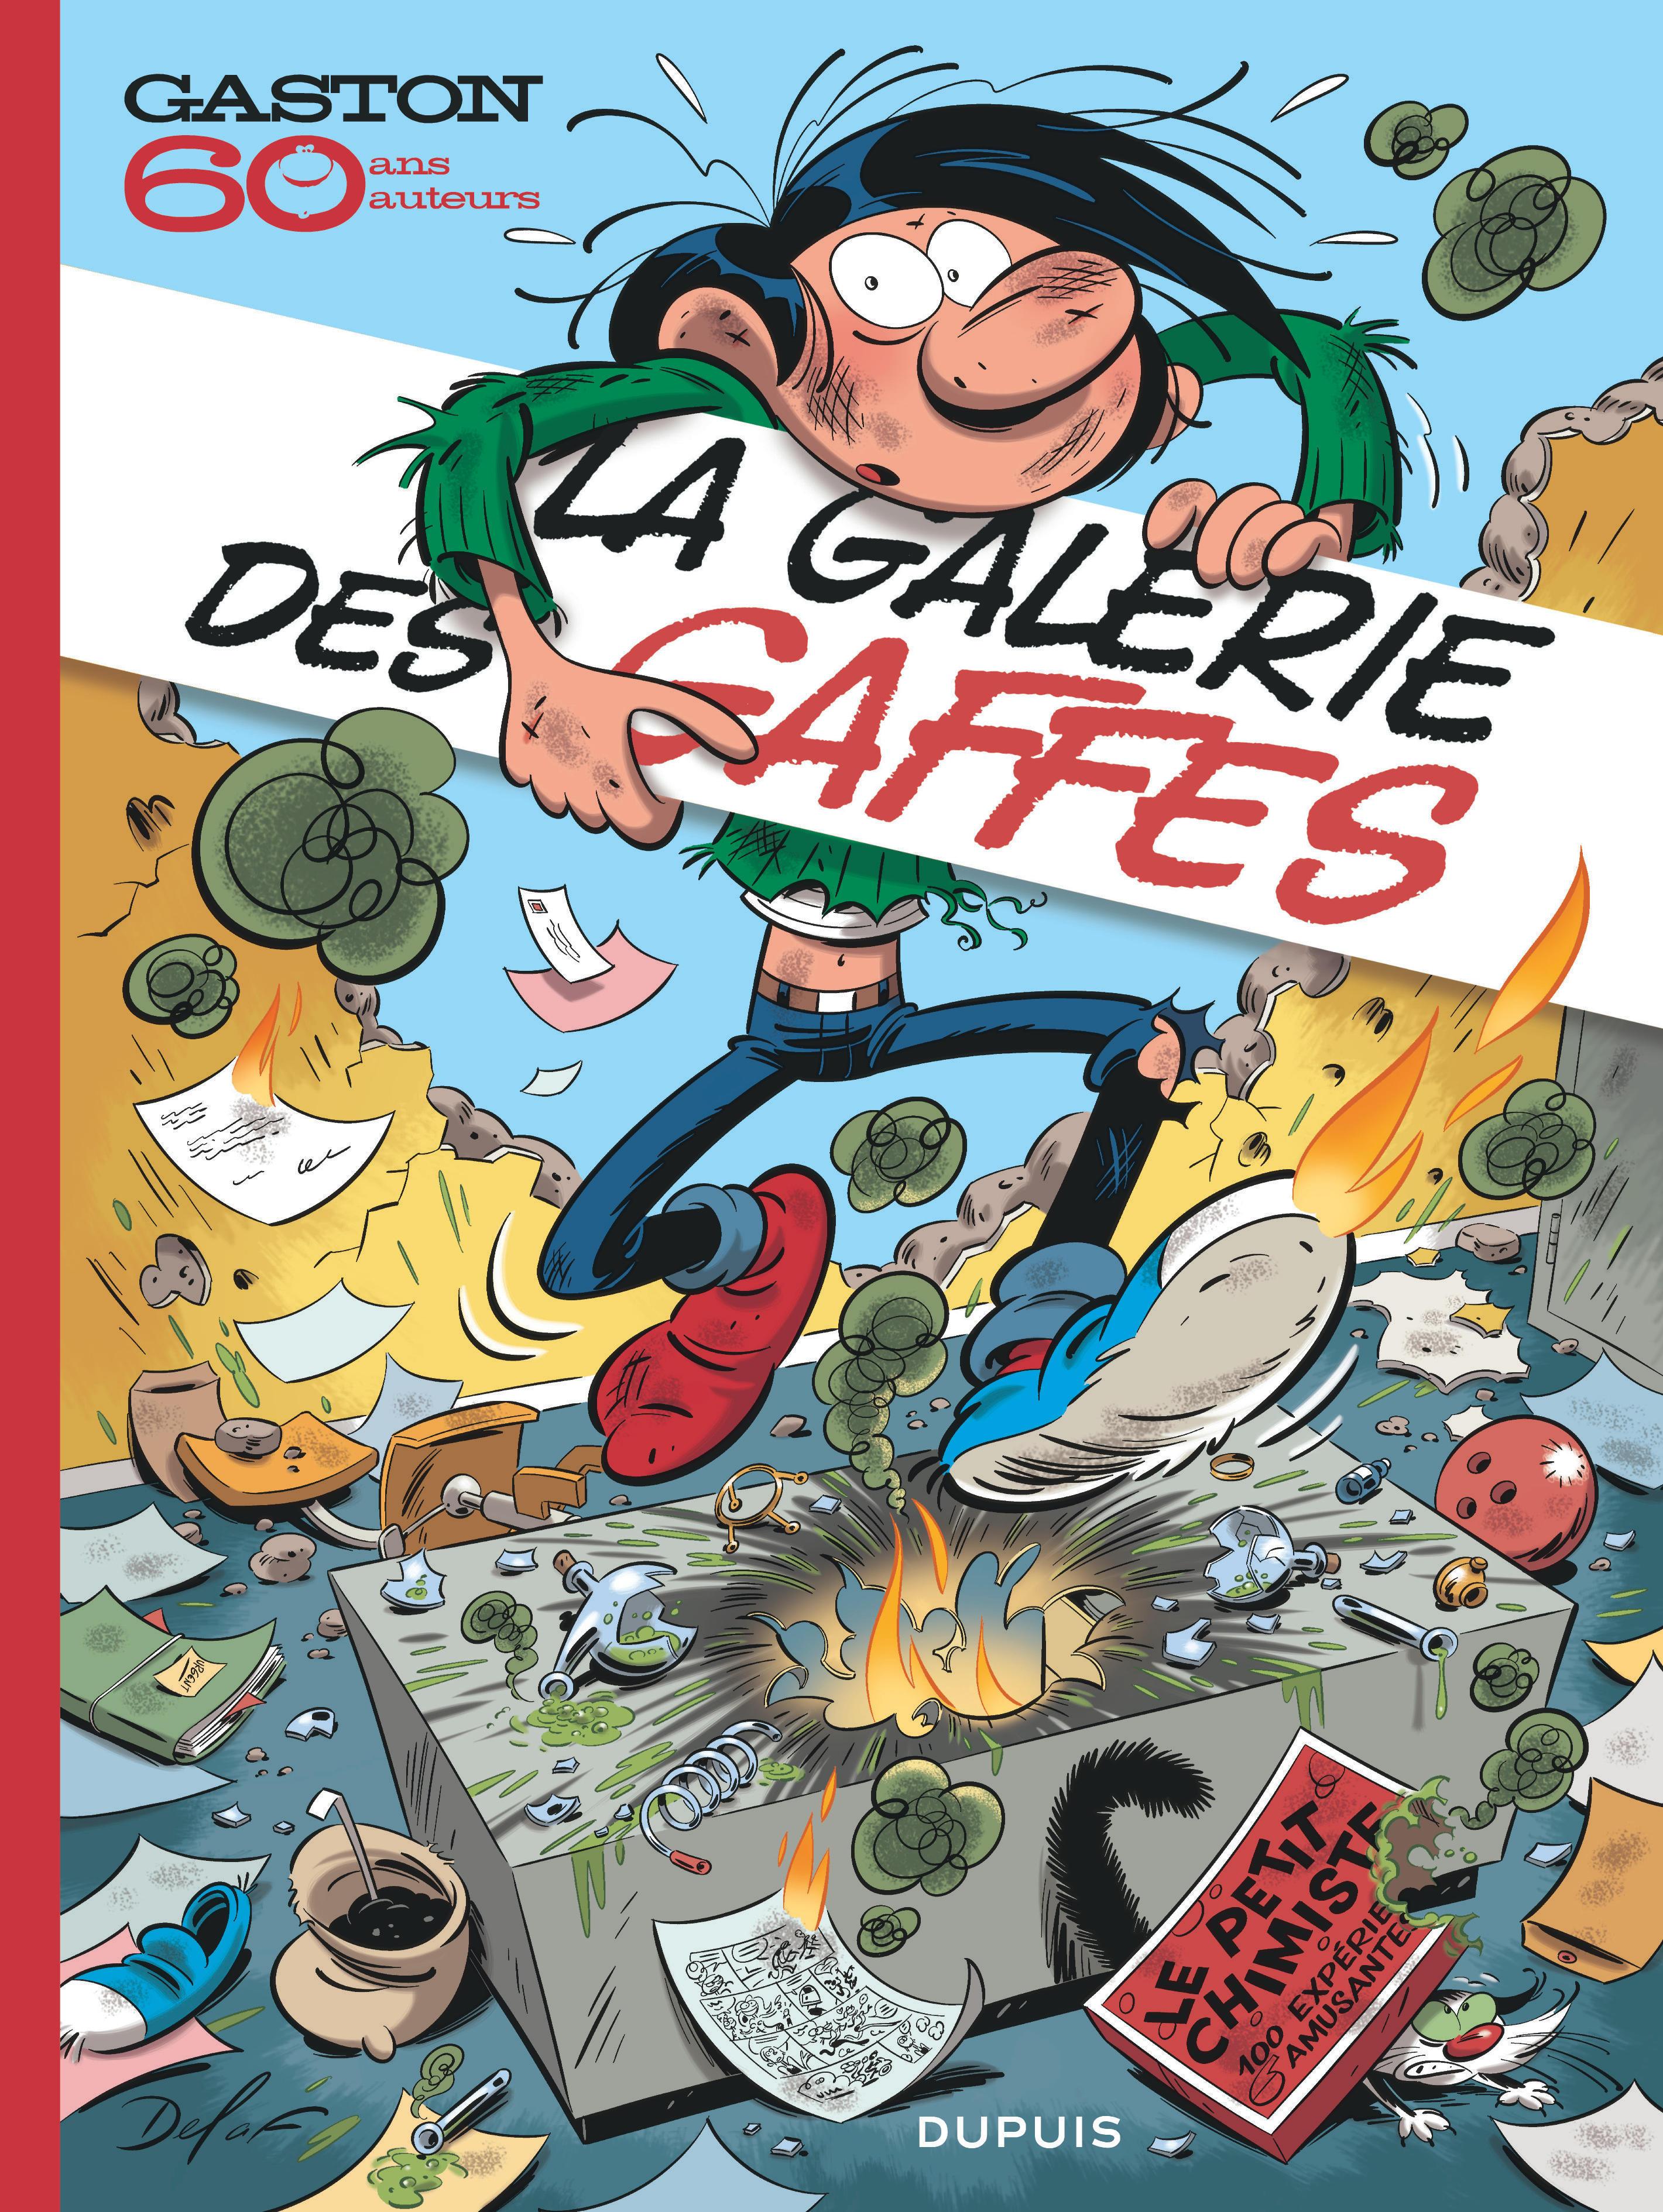 GASTON GALERIE DES GAFFES GASTON - LA GALERIE DES GAFFES - TOME 0 - GALERIE DES GAFFES (EDITION SPEC